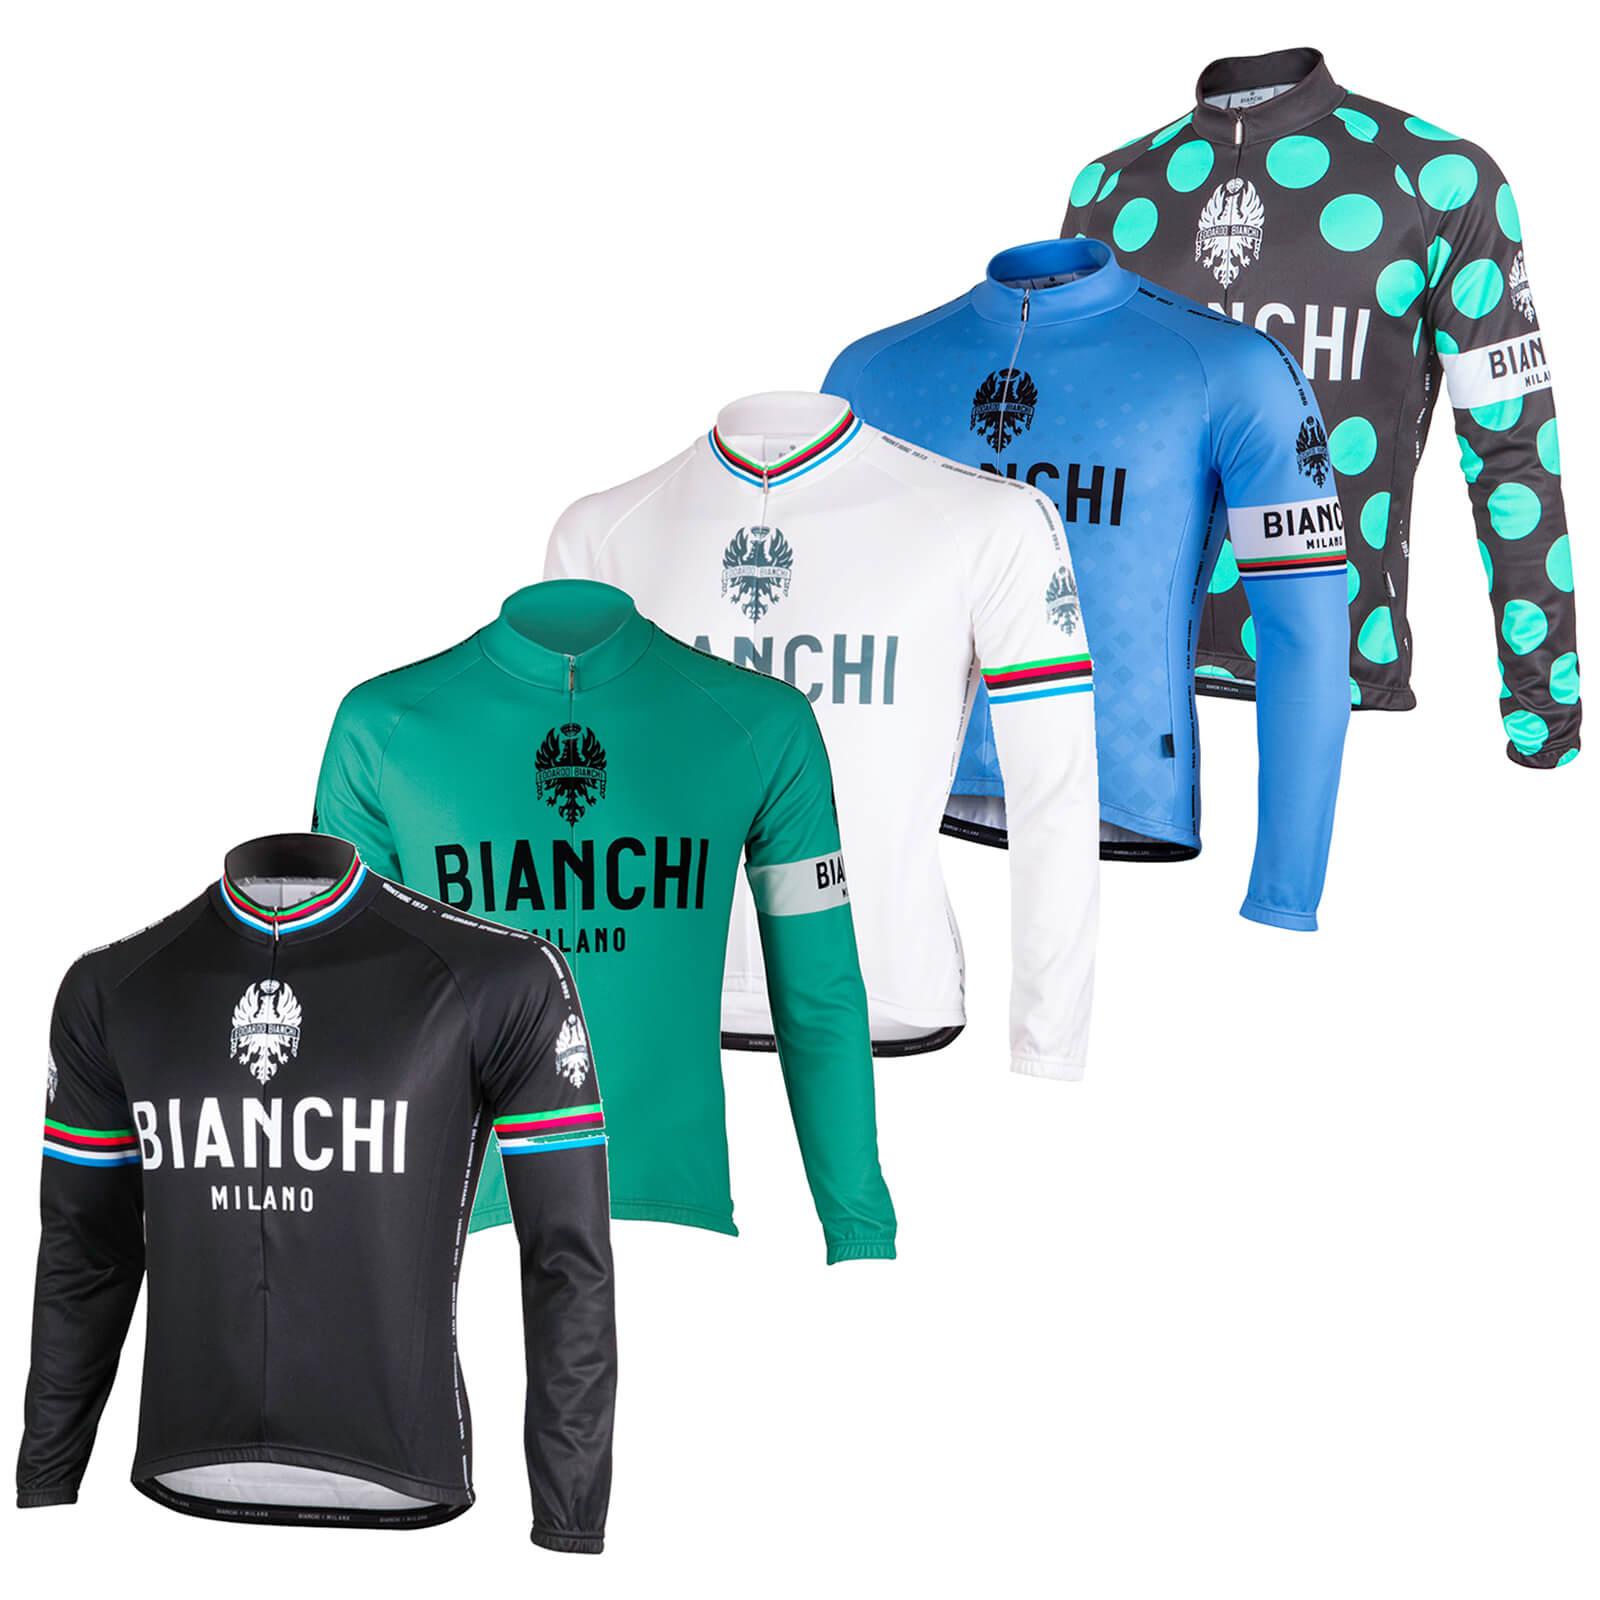 Bianchi Leggenda Long Sleeve Jersey